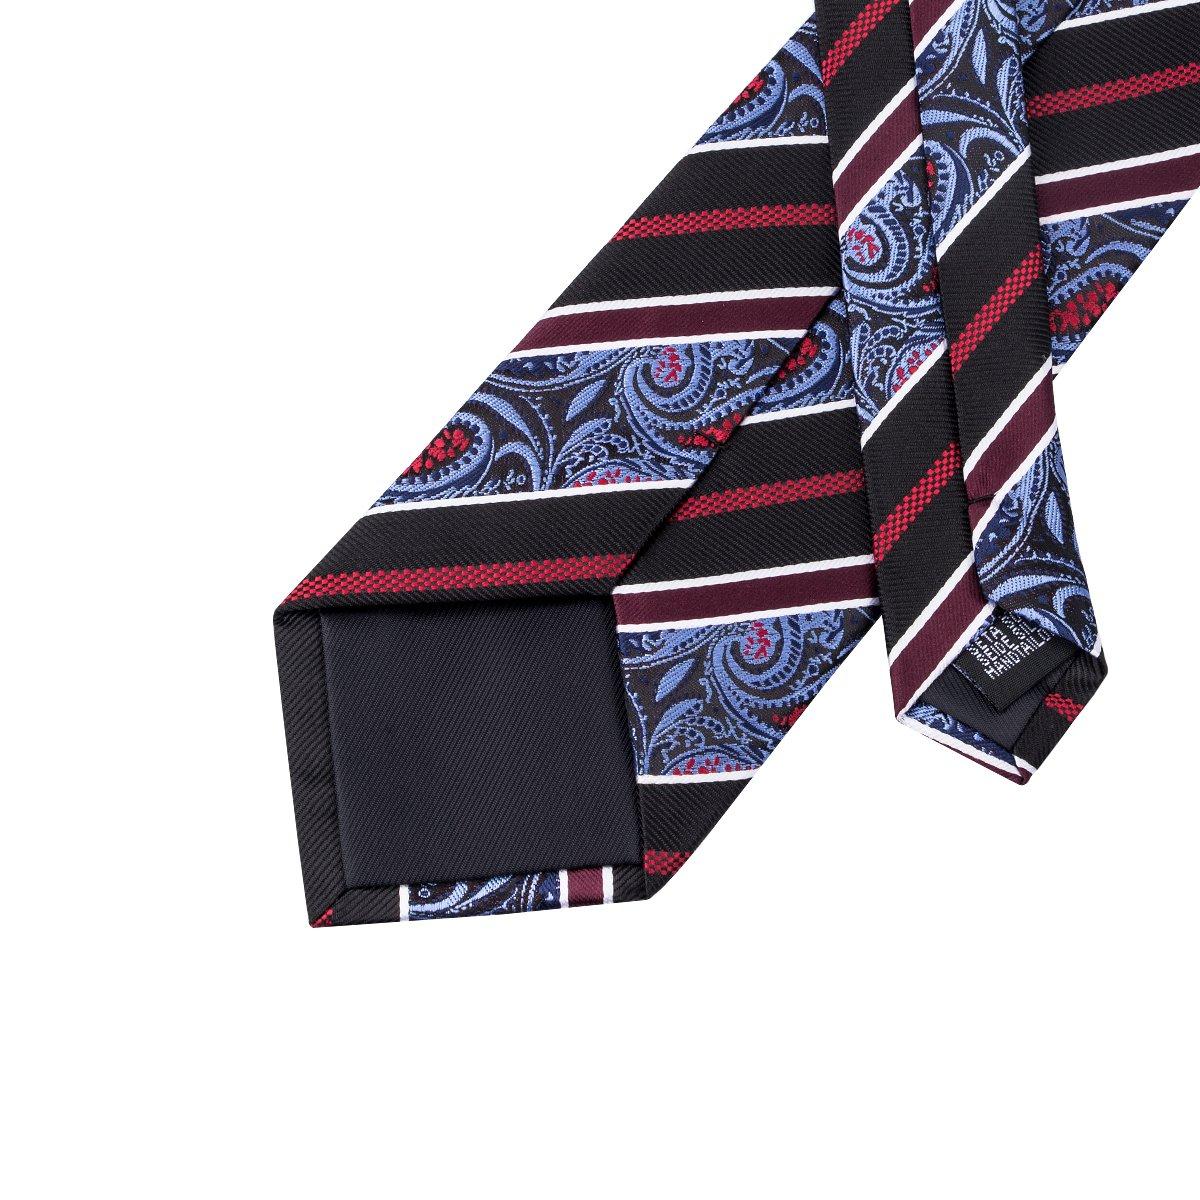 DiBanGu Paisley Tie and Pocket Square for Men Silk Necktie Handkerchief Cufflink Set Formal